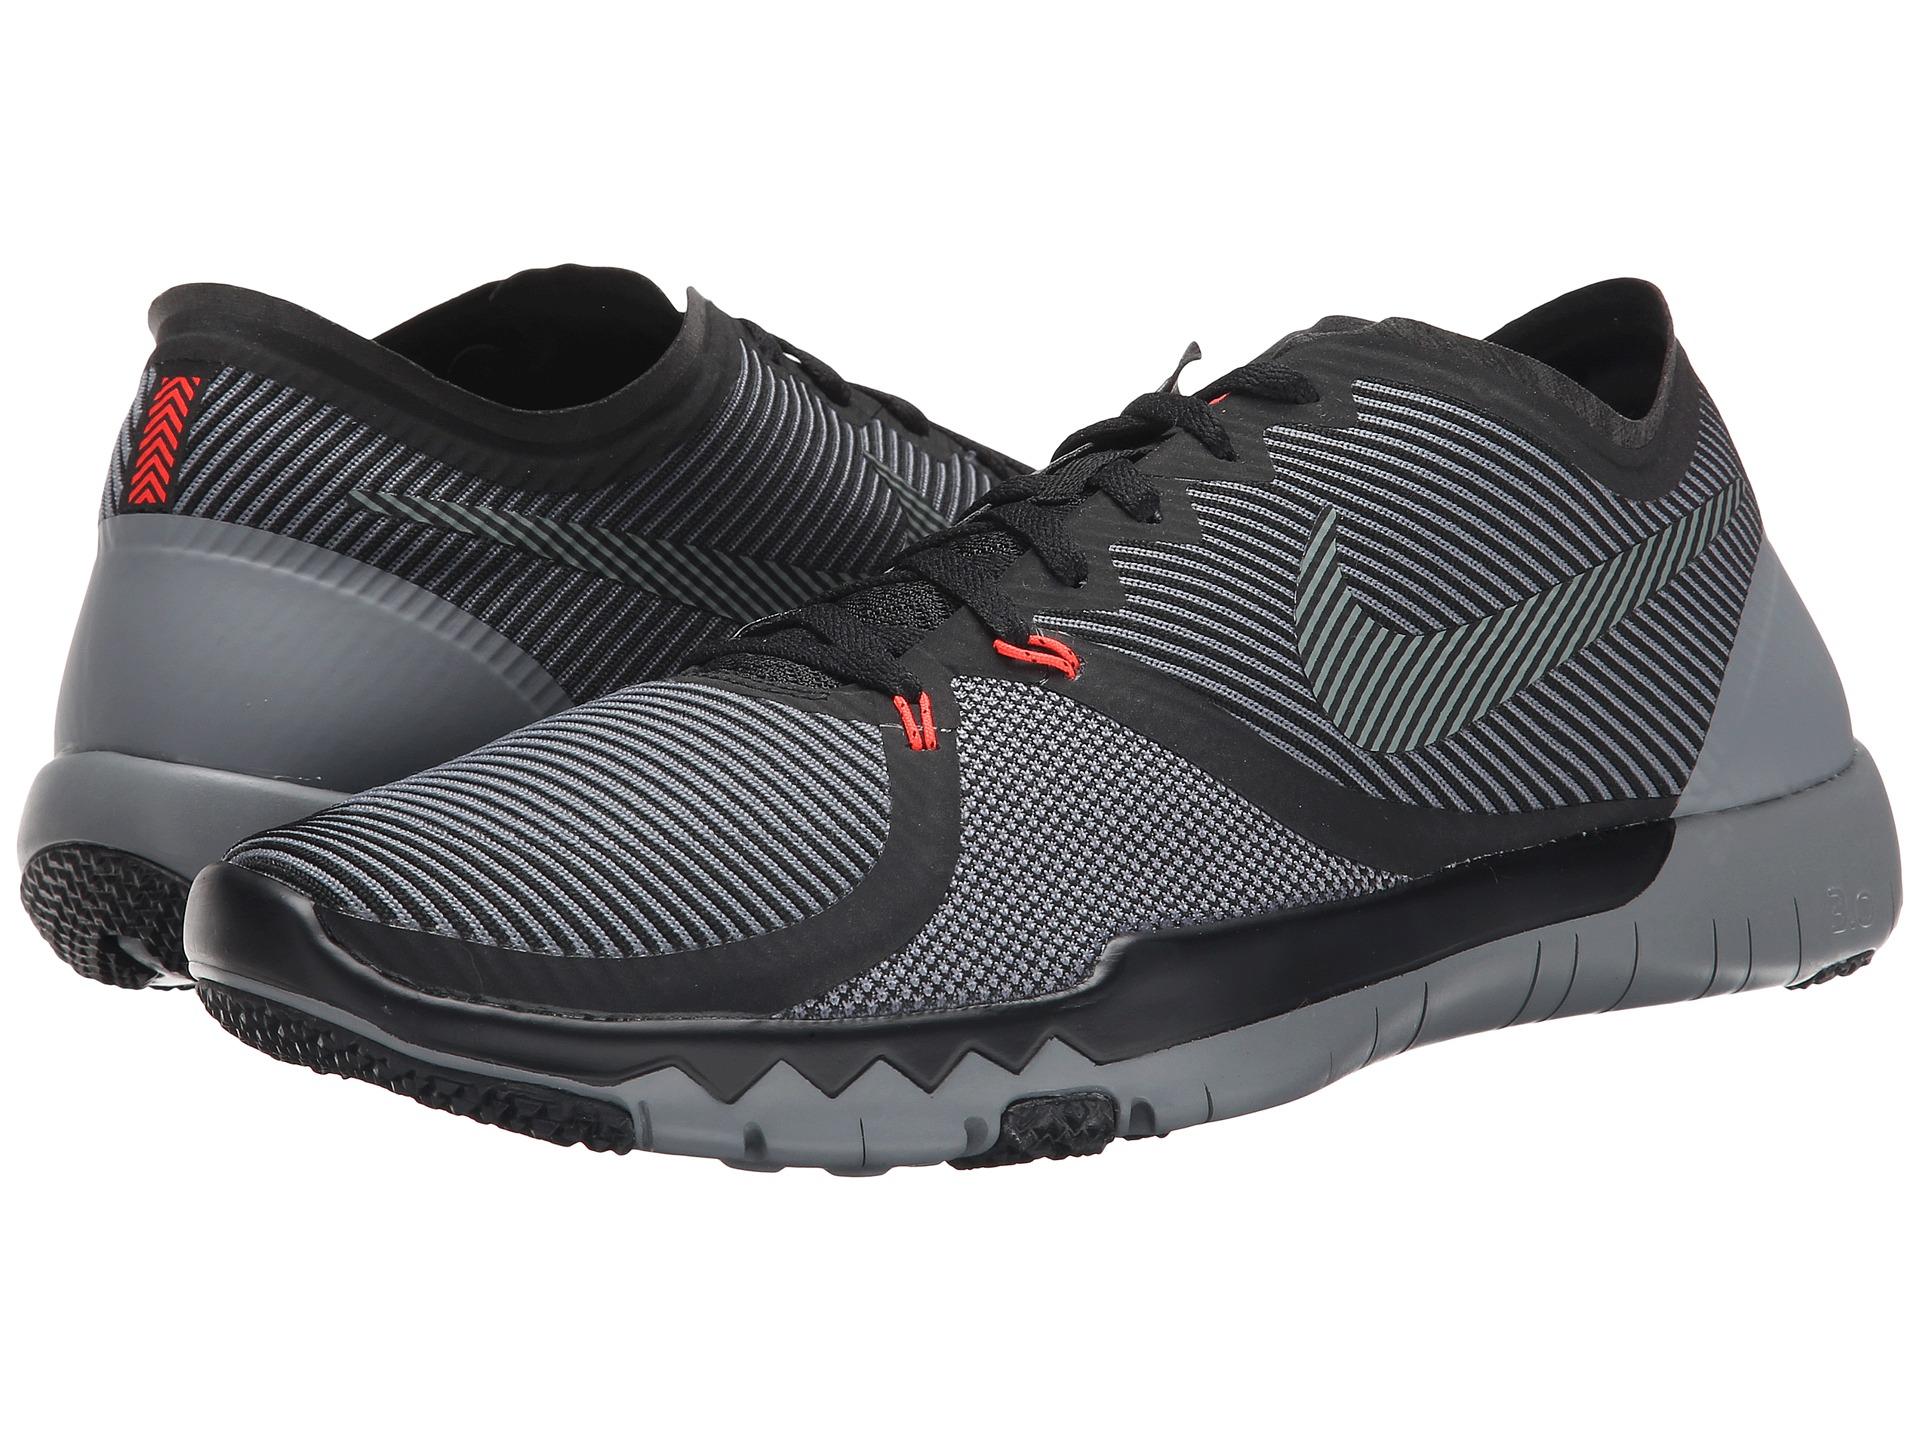 Nike Free 3.0 V4 Fond Décran Noir Et Blanc